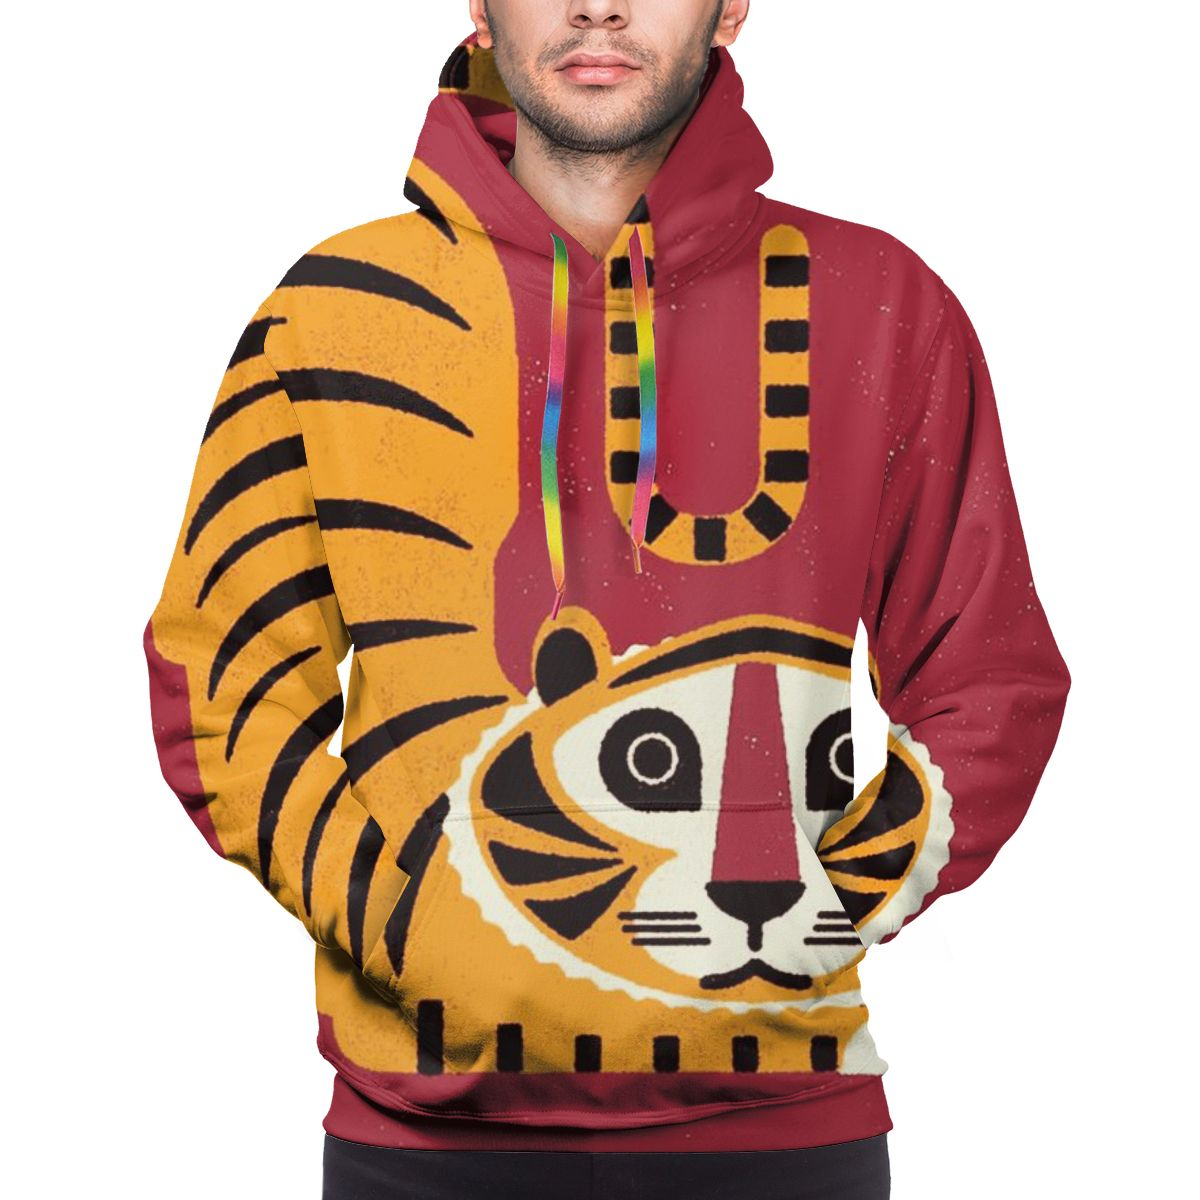 NOISYDESIGNS Festive Tiger 3D Print Sweatshirt Harajuku Hoodie Tracksuit Yellow Tigers Design Hoodies Animal Fashion Jacket